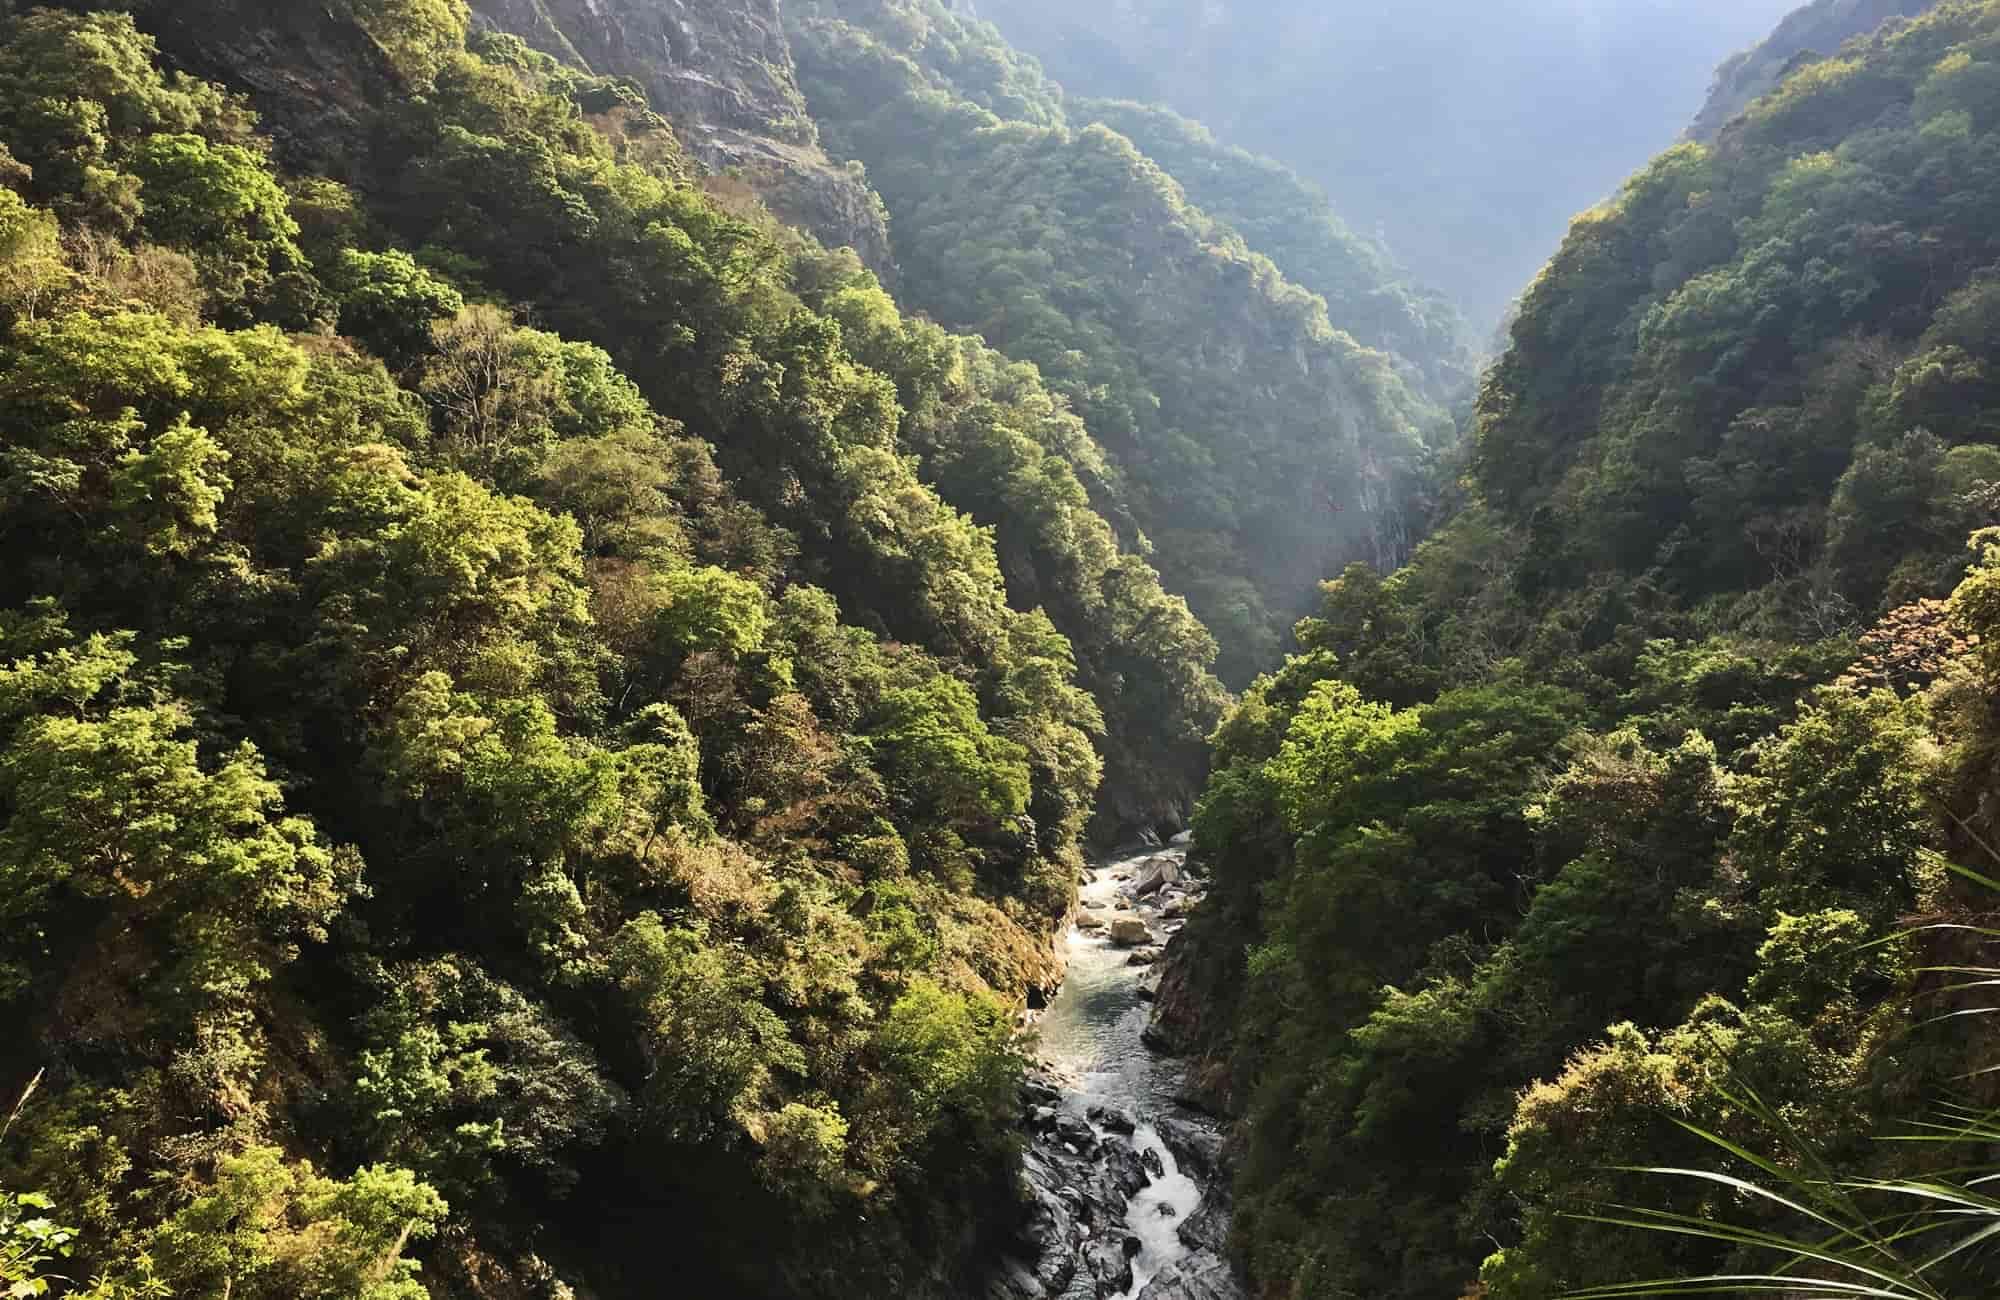 Voyage à Taïwan - Gorges de Taroko - Amplitudes